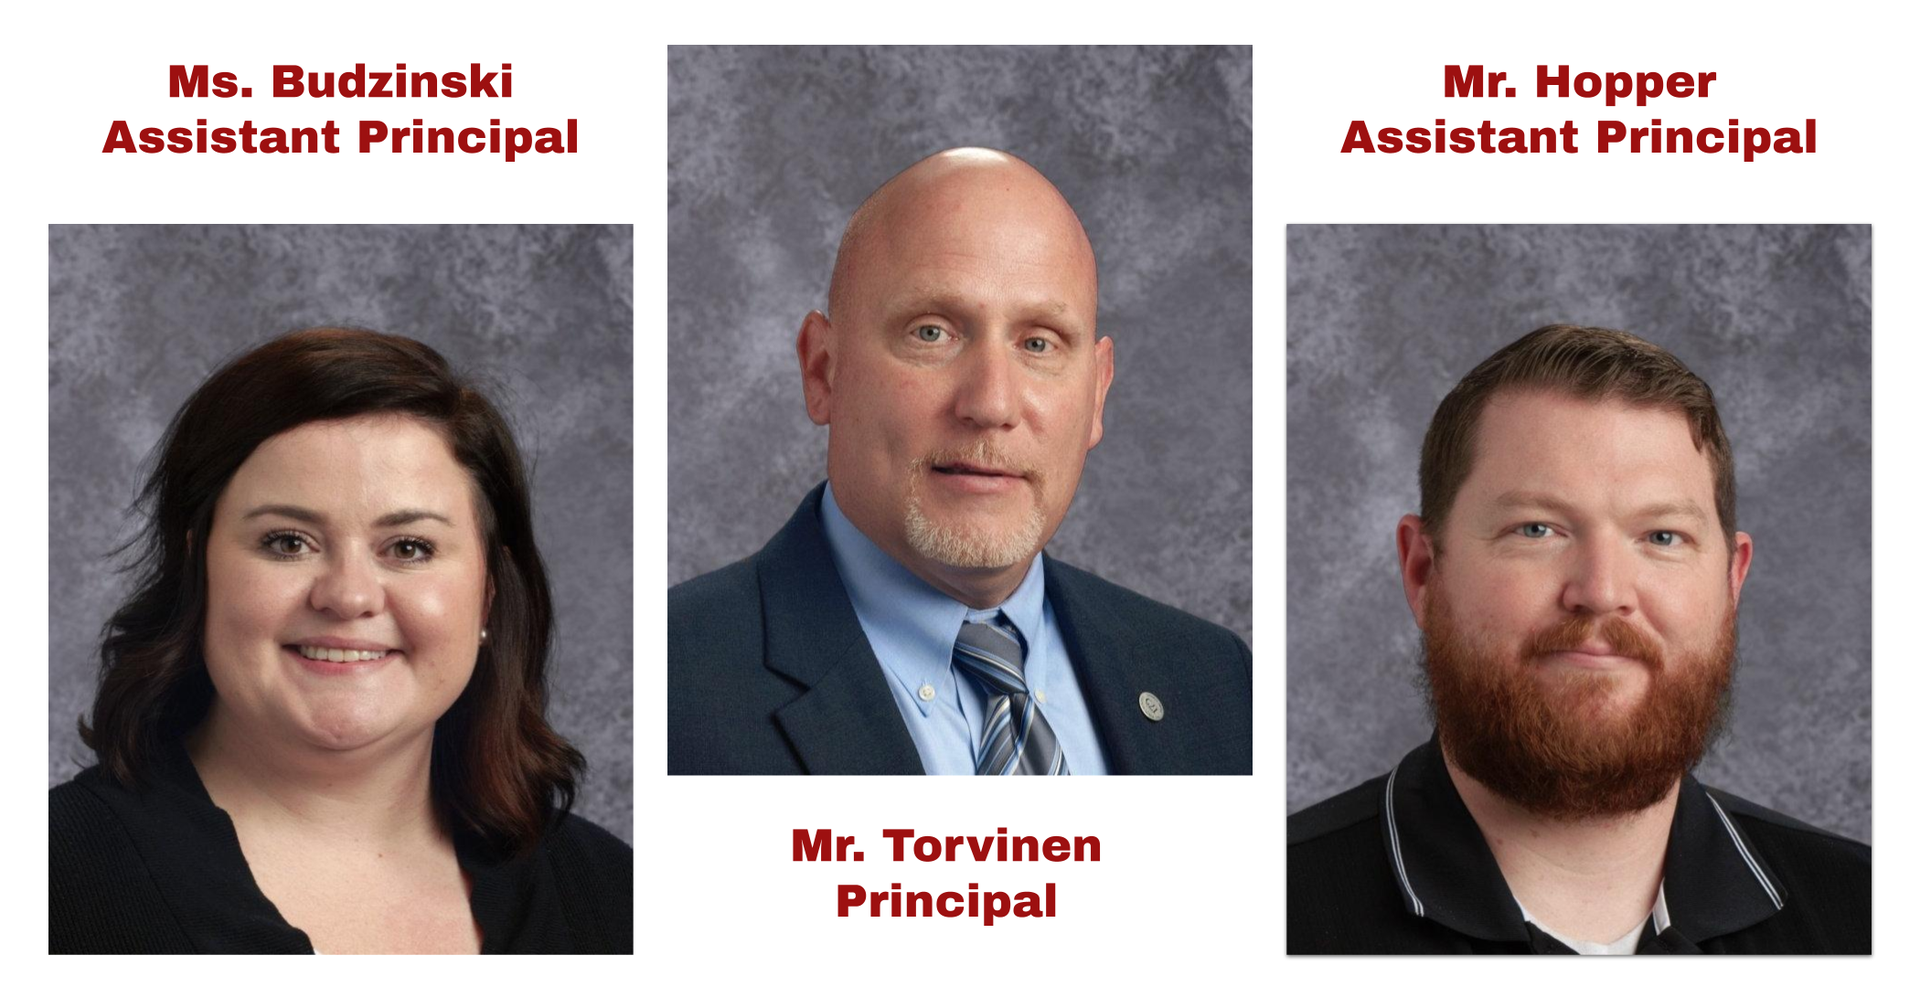 East High Administrative staff - Principal, Mr. Torvinen, Assistant Principal, Ms. Budzinski and Mr. Hopper